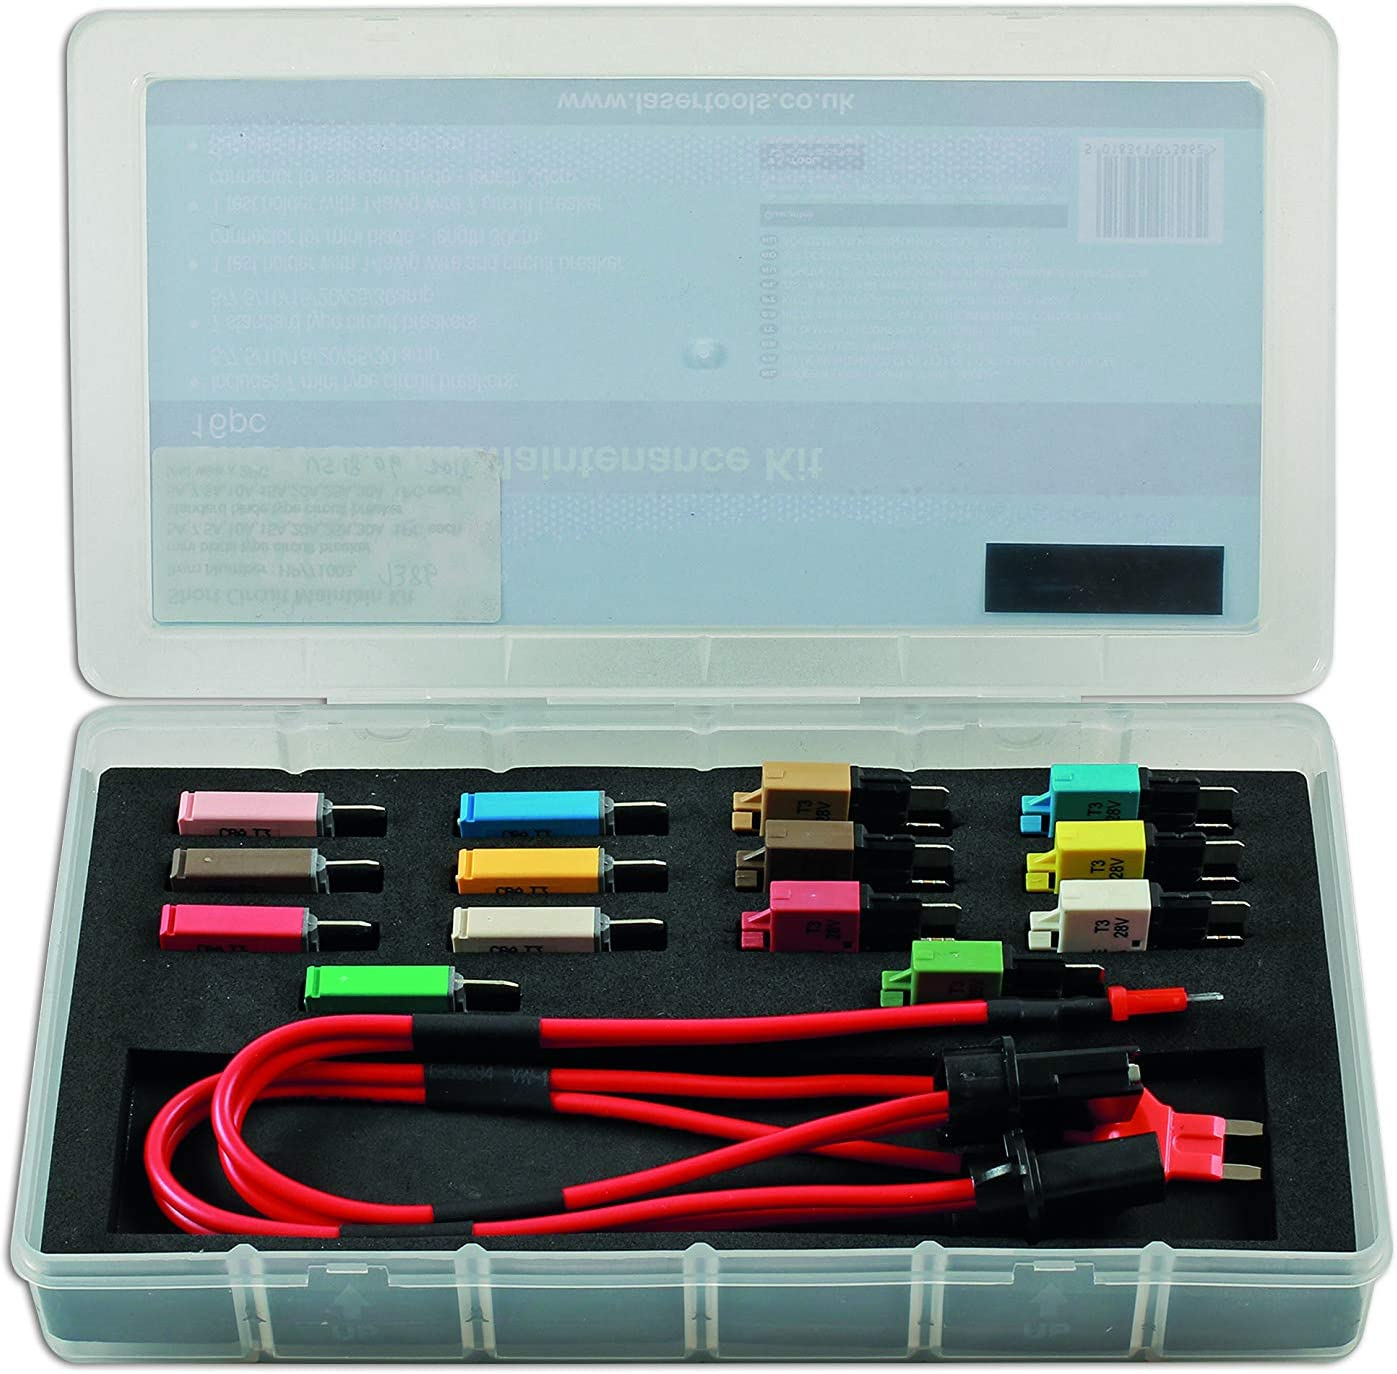 Laser Max 78% OFF 7386 Short Circuit 16pc Kit Diagnostic Max 73% OFF